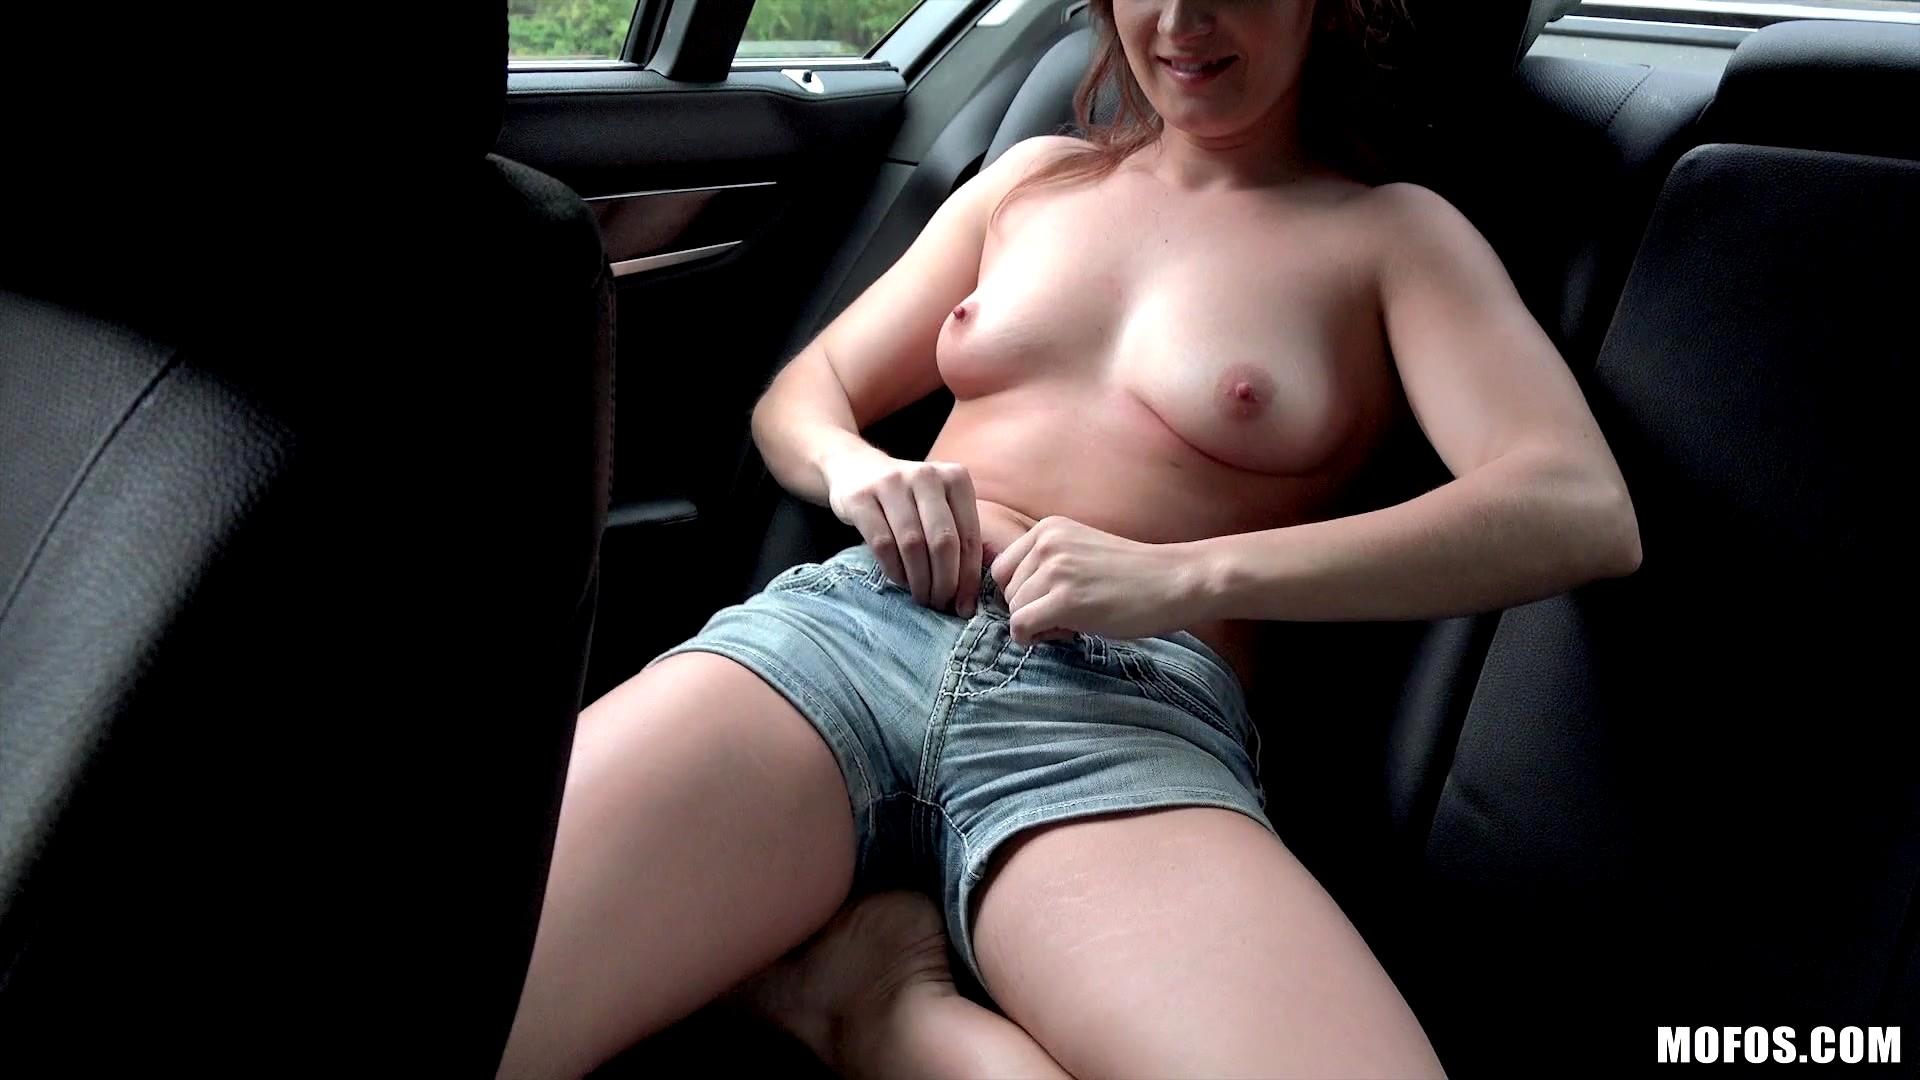 sadie leigh porn